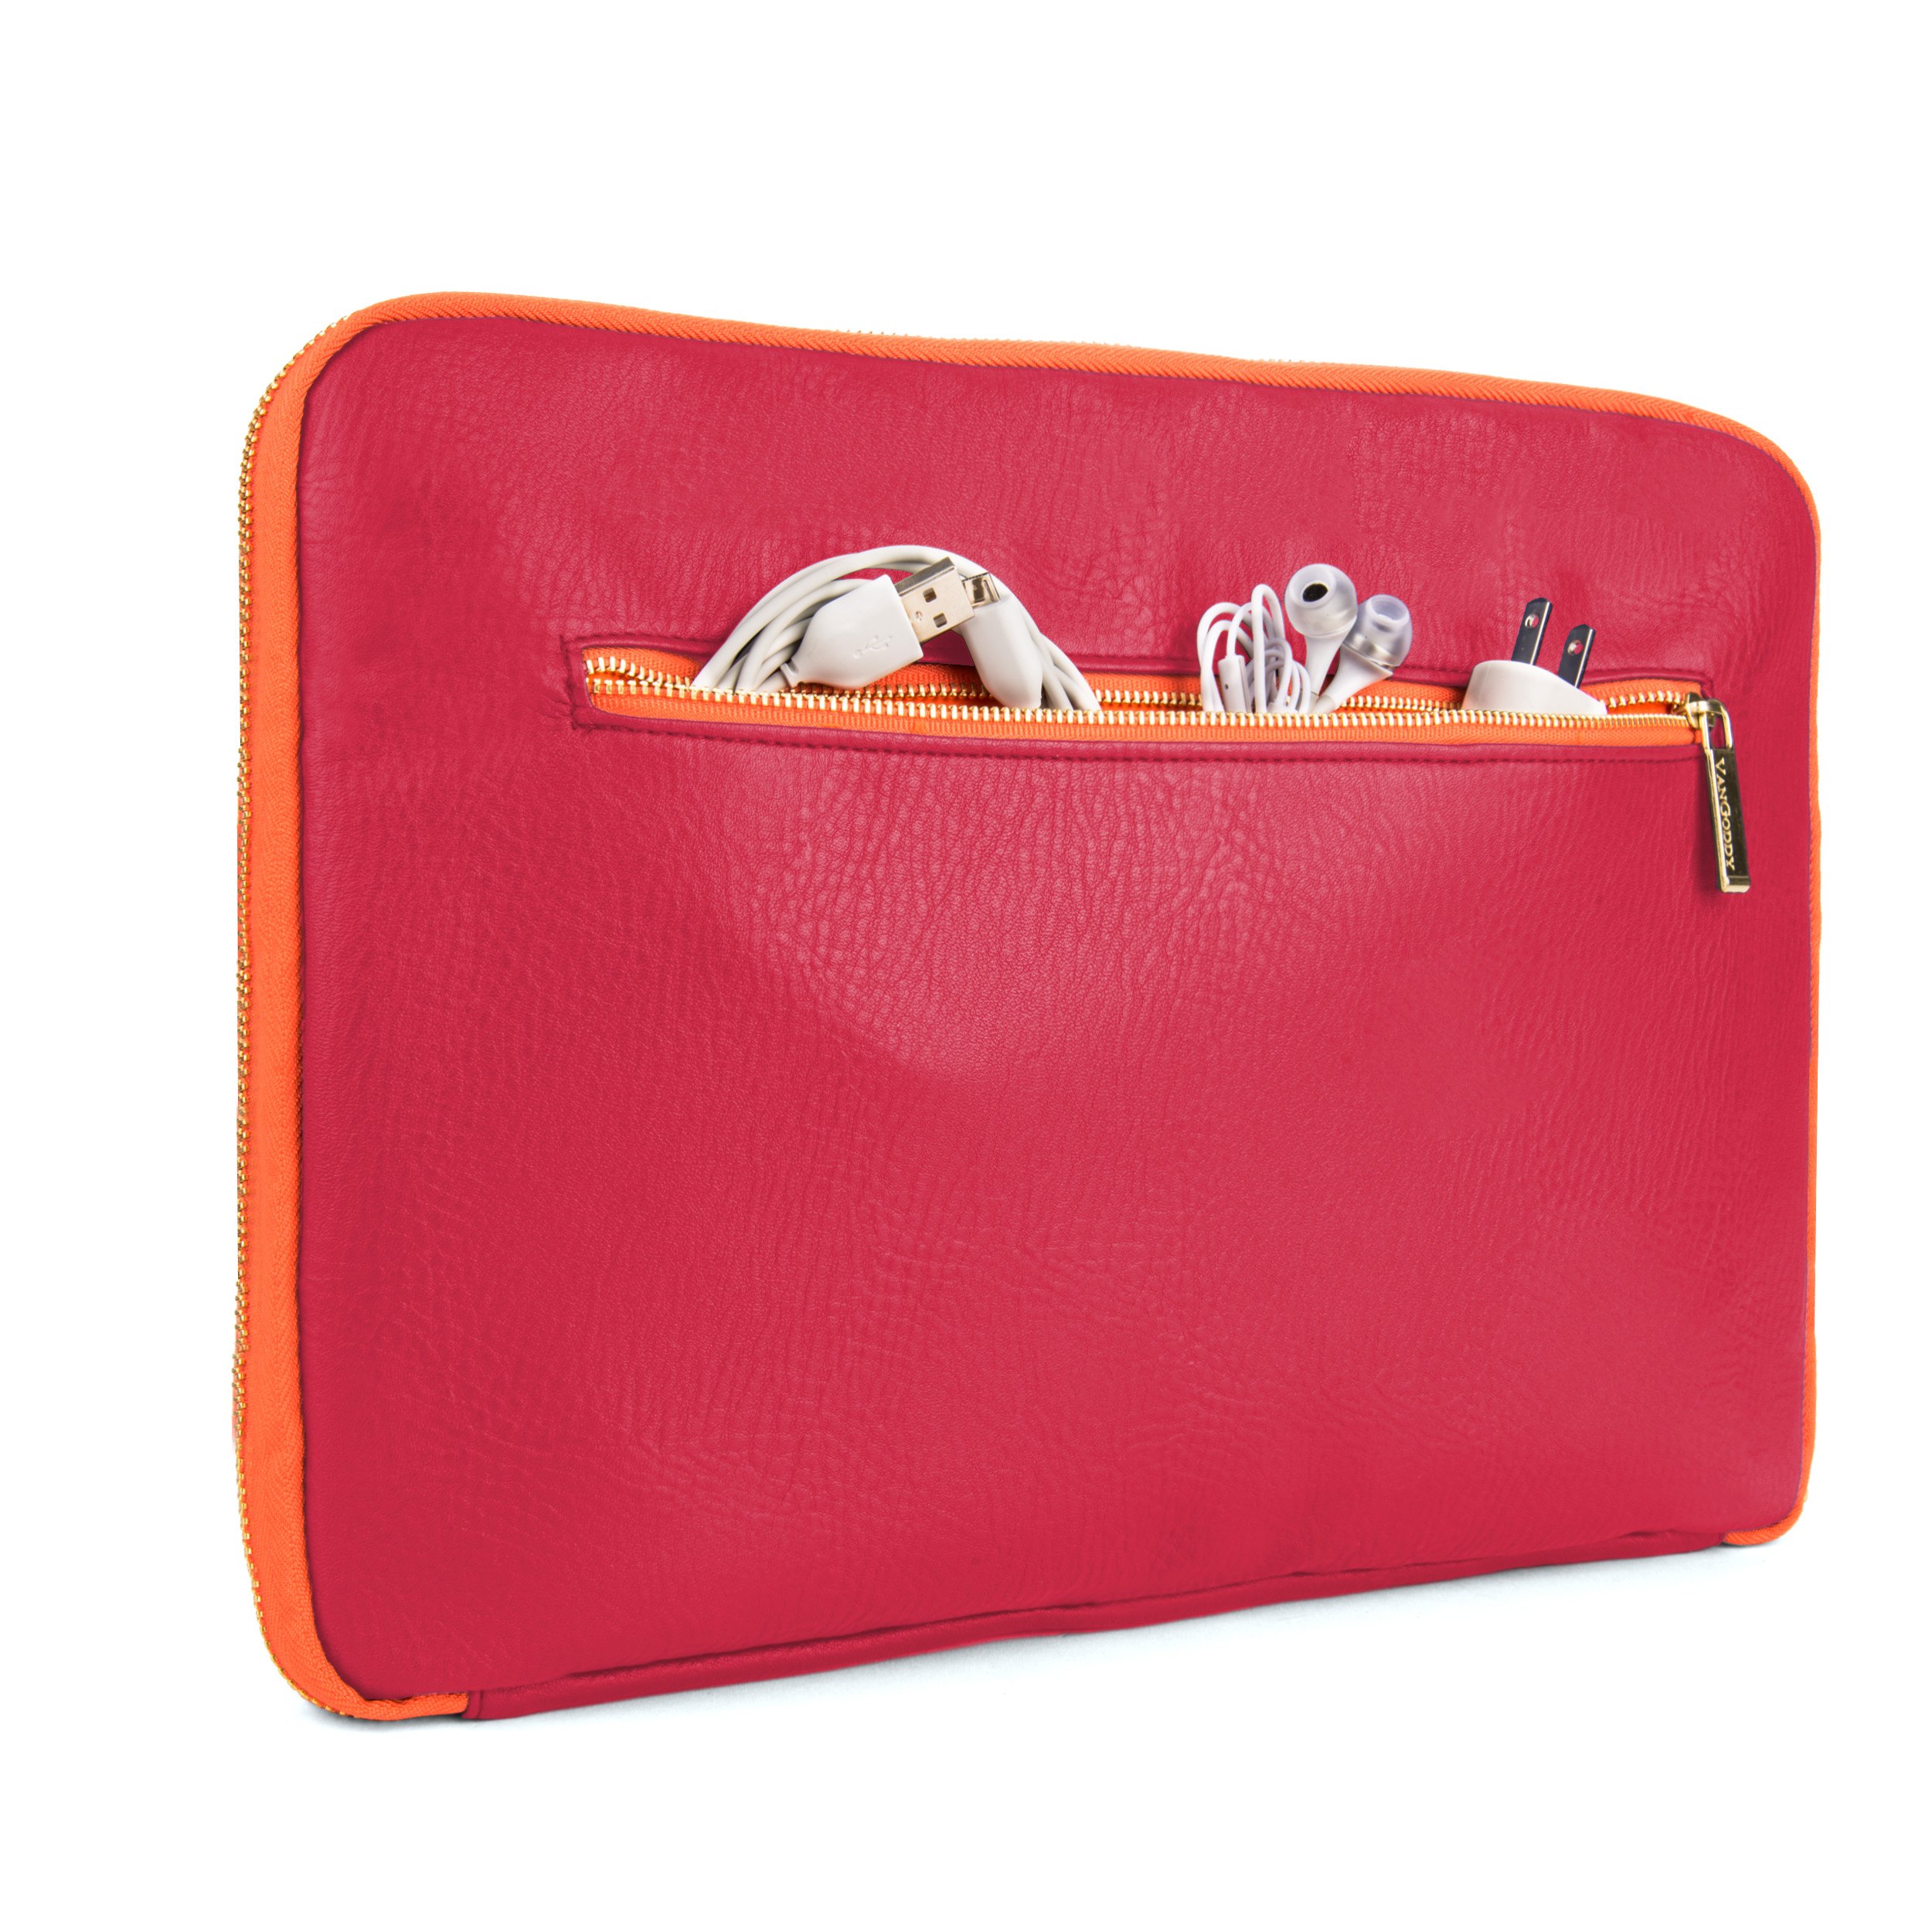 "Irista 15"" Laptop Sleeve (Magenta/Orange)"